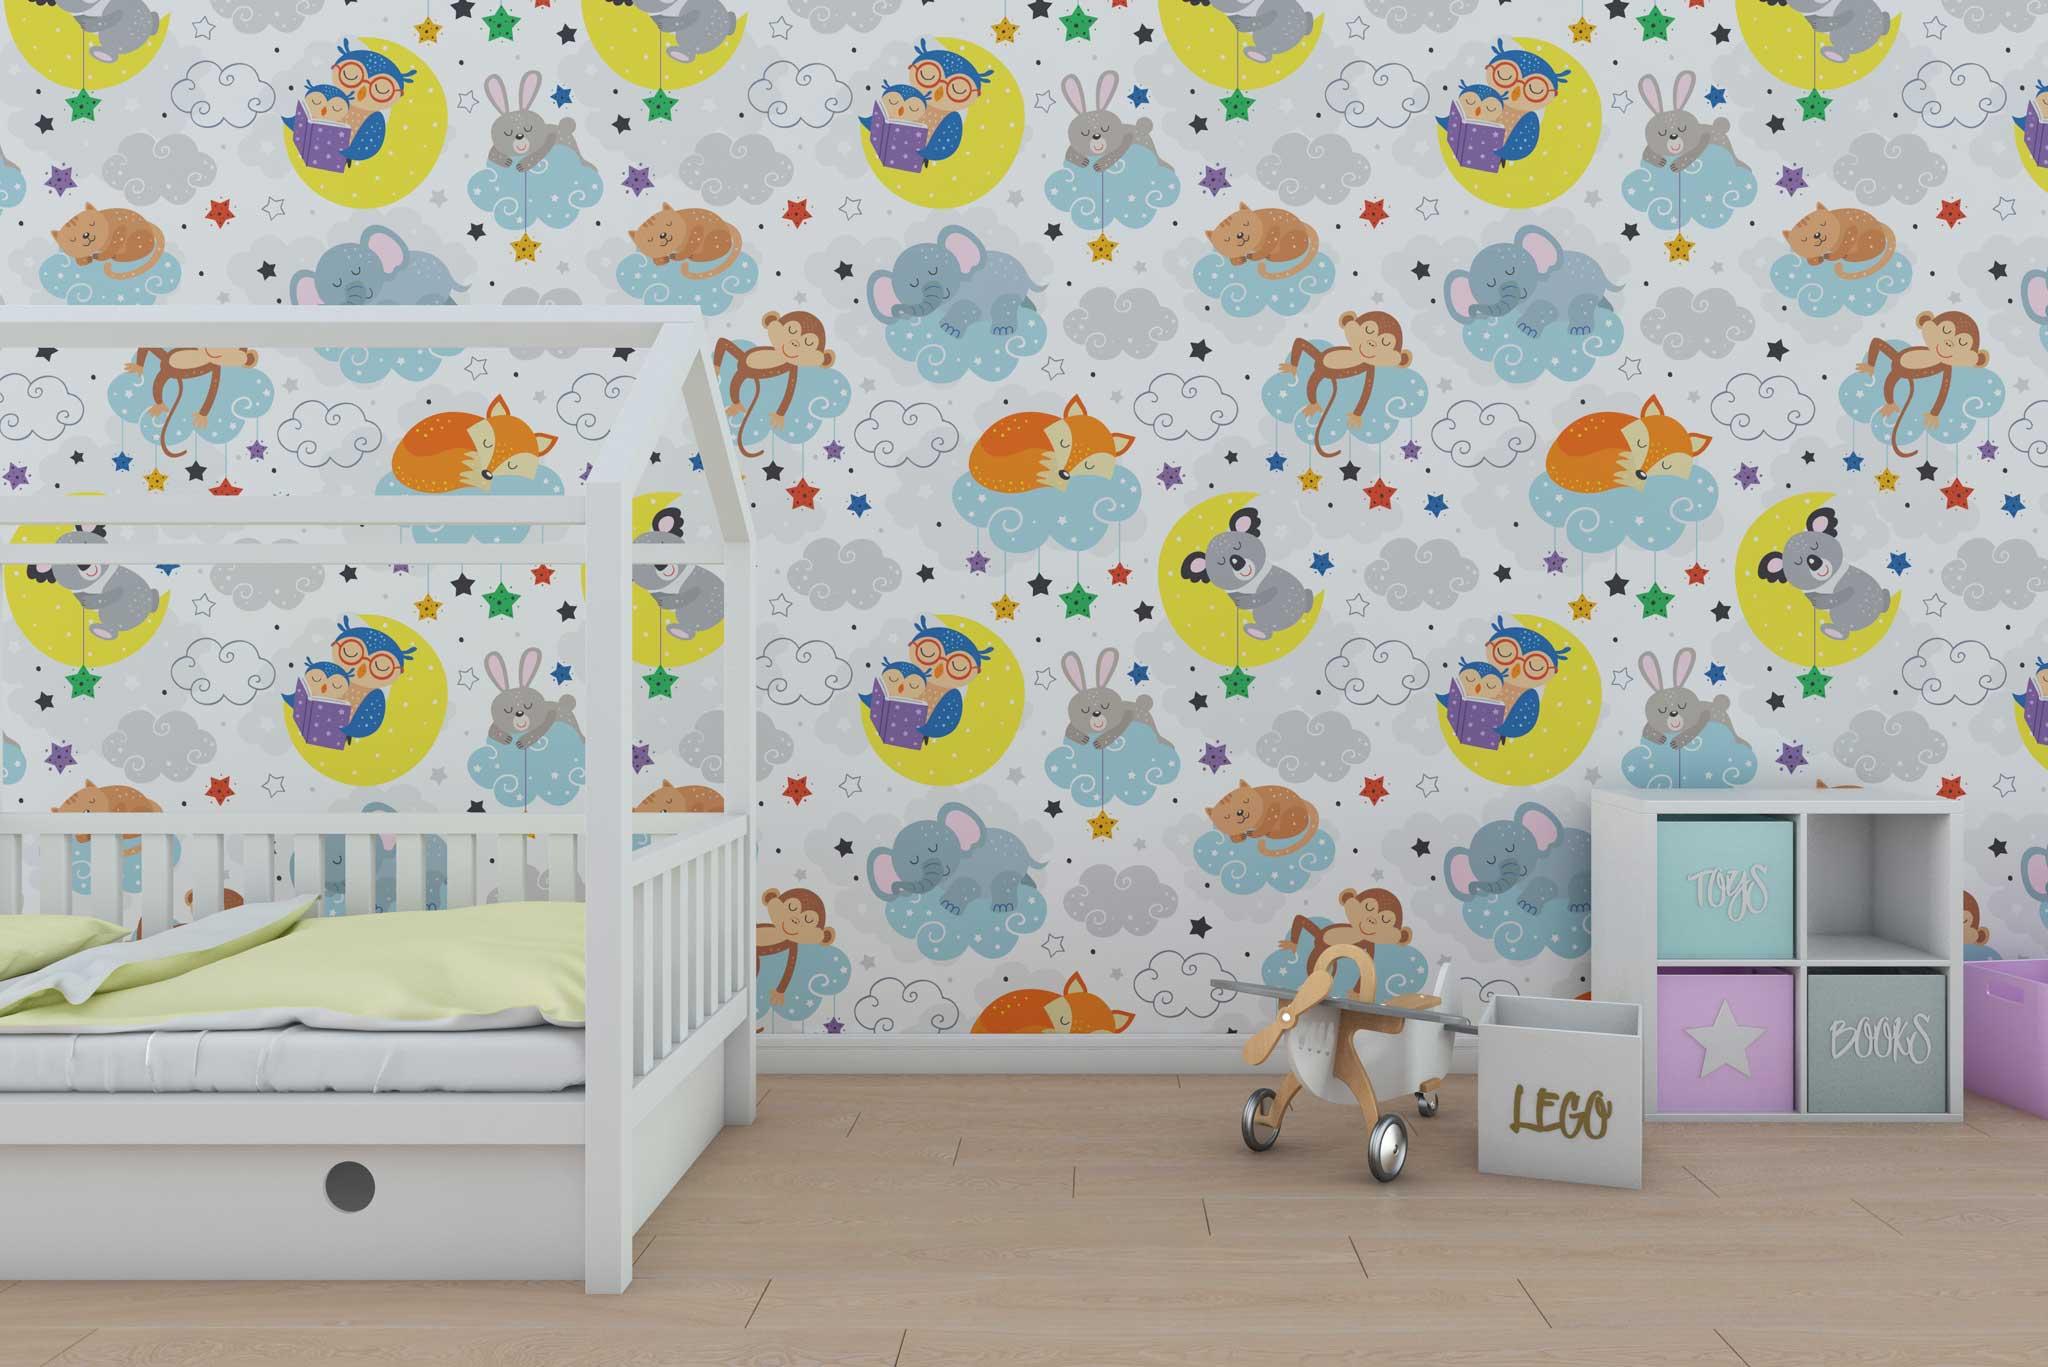 tapet-fototapet-design-personalizat-customizabil-comanda-special-camera-dormitor-copii-model-desen-animale-somnoroase-maimuta-bufnita-koala-norisori-multicolor-fundal-alb